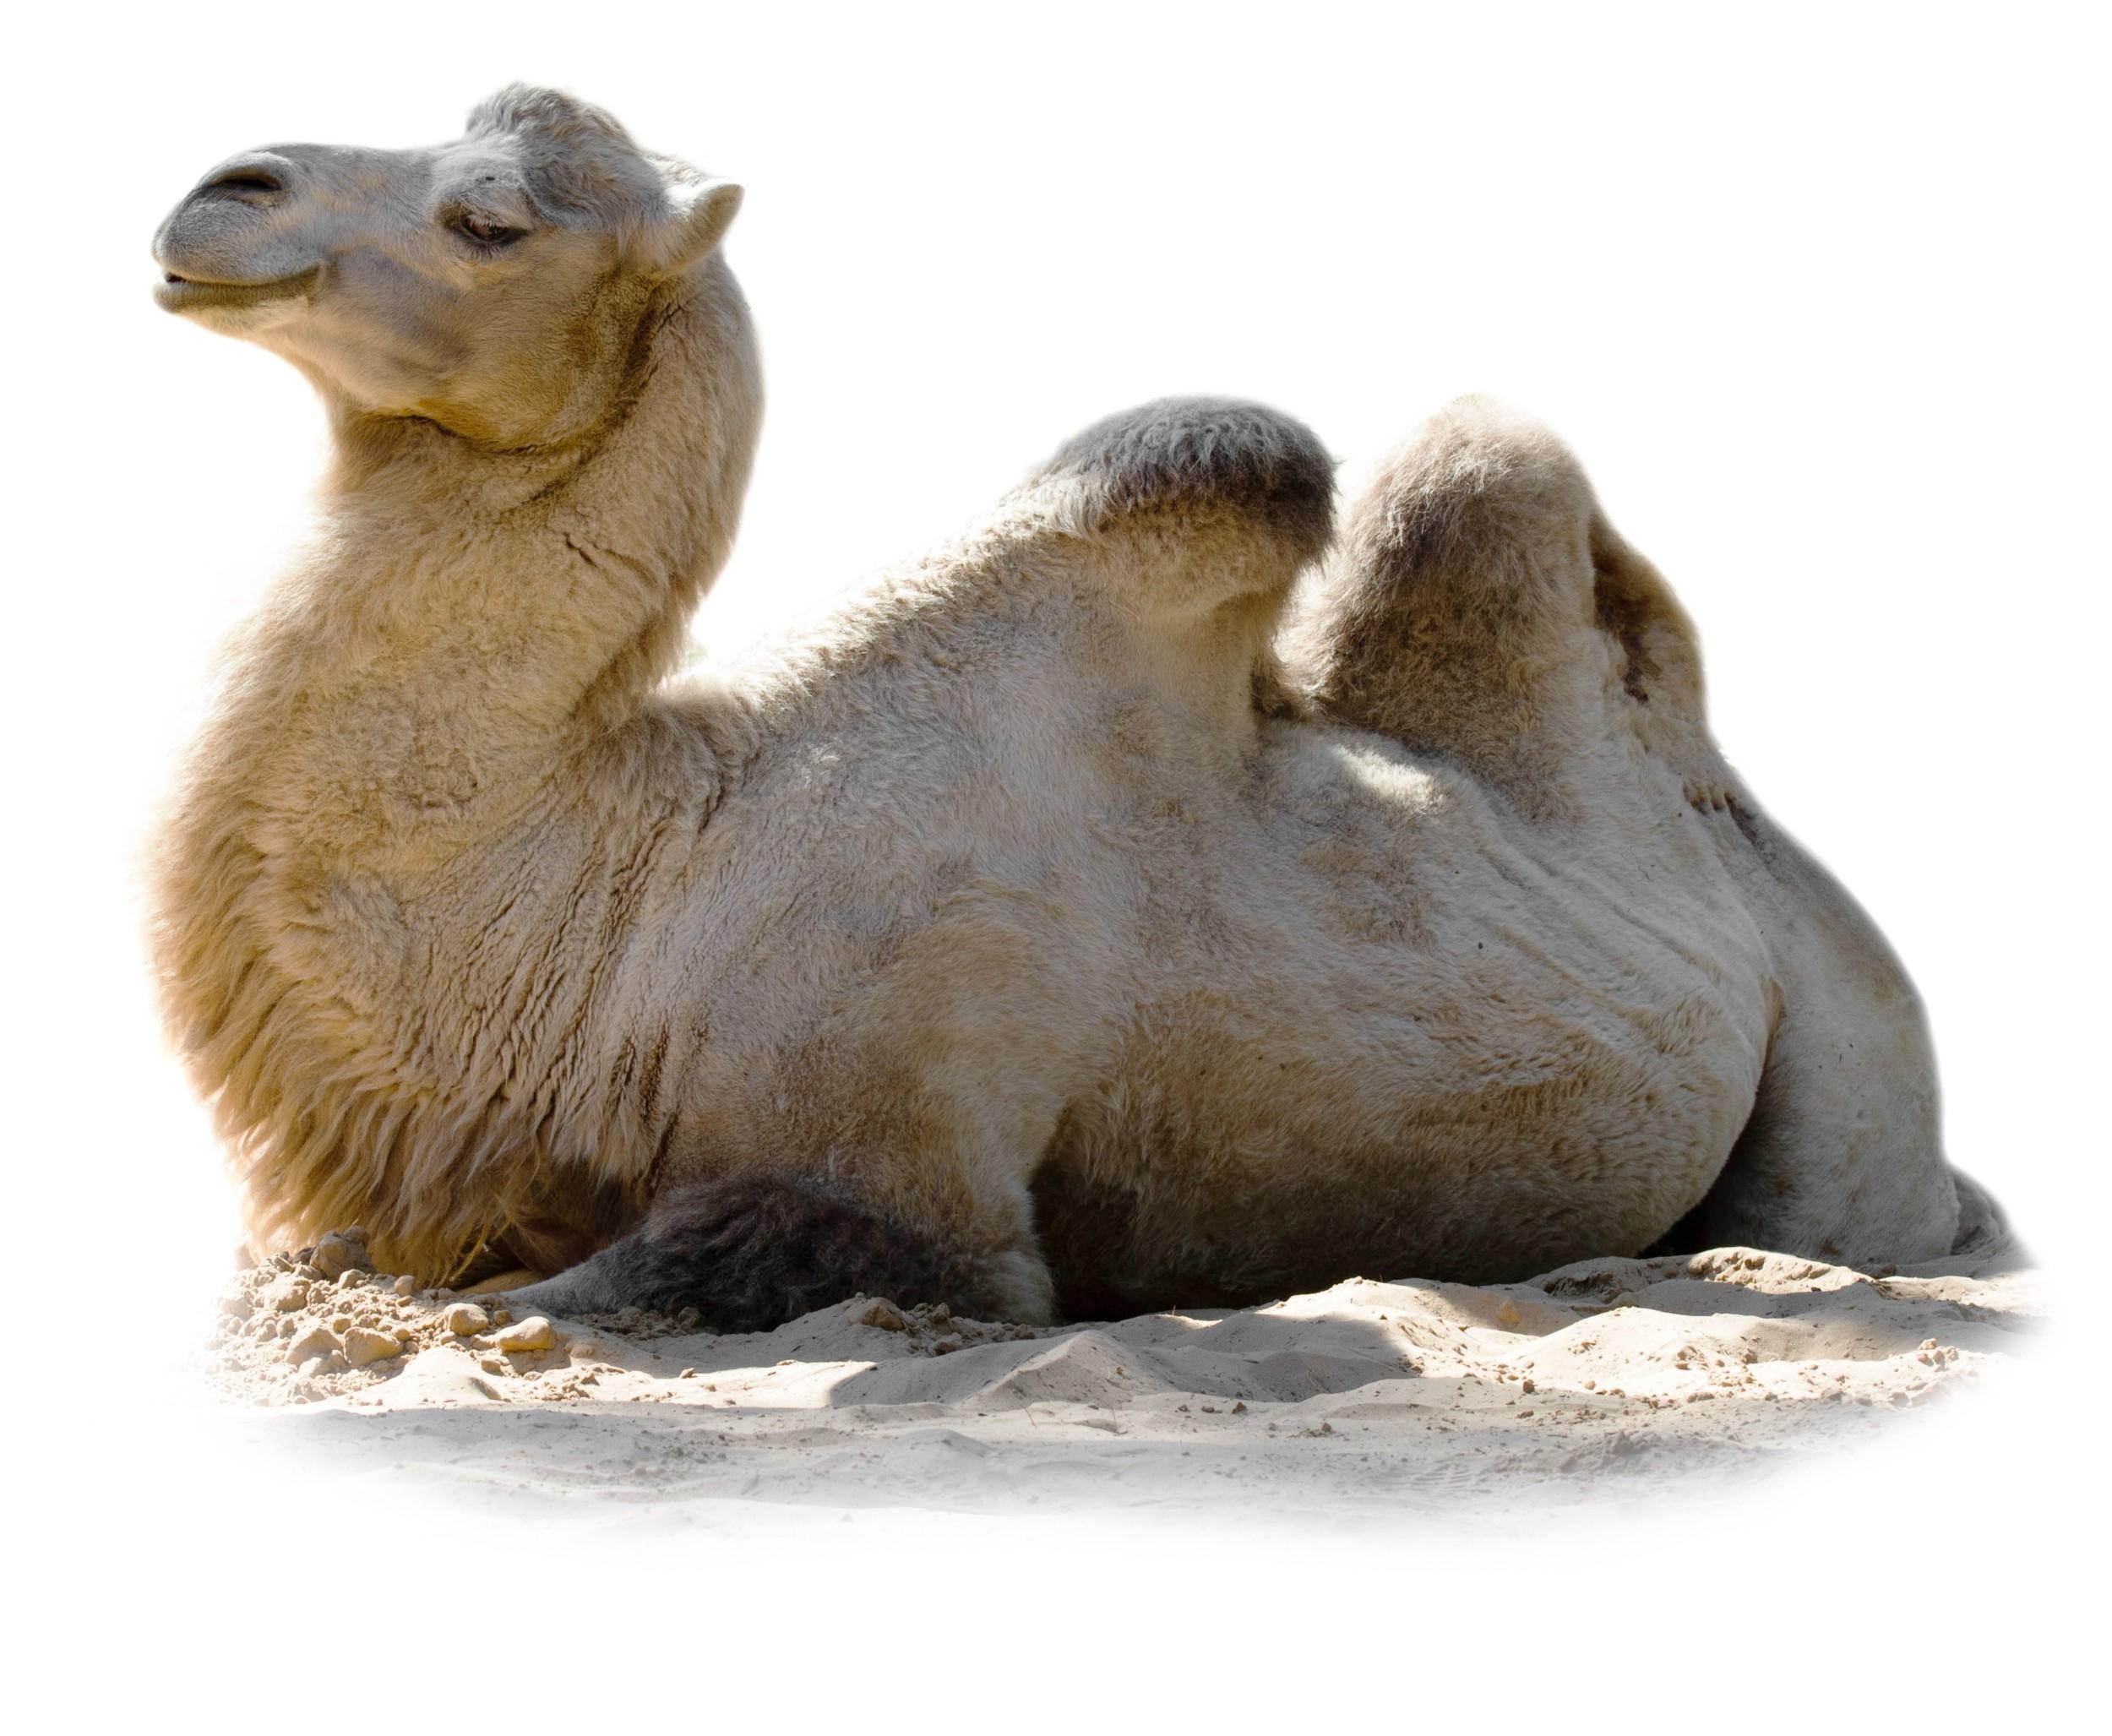 Pata de camelo no trem - 1 part 5